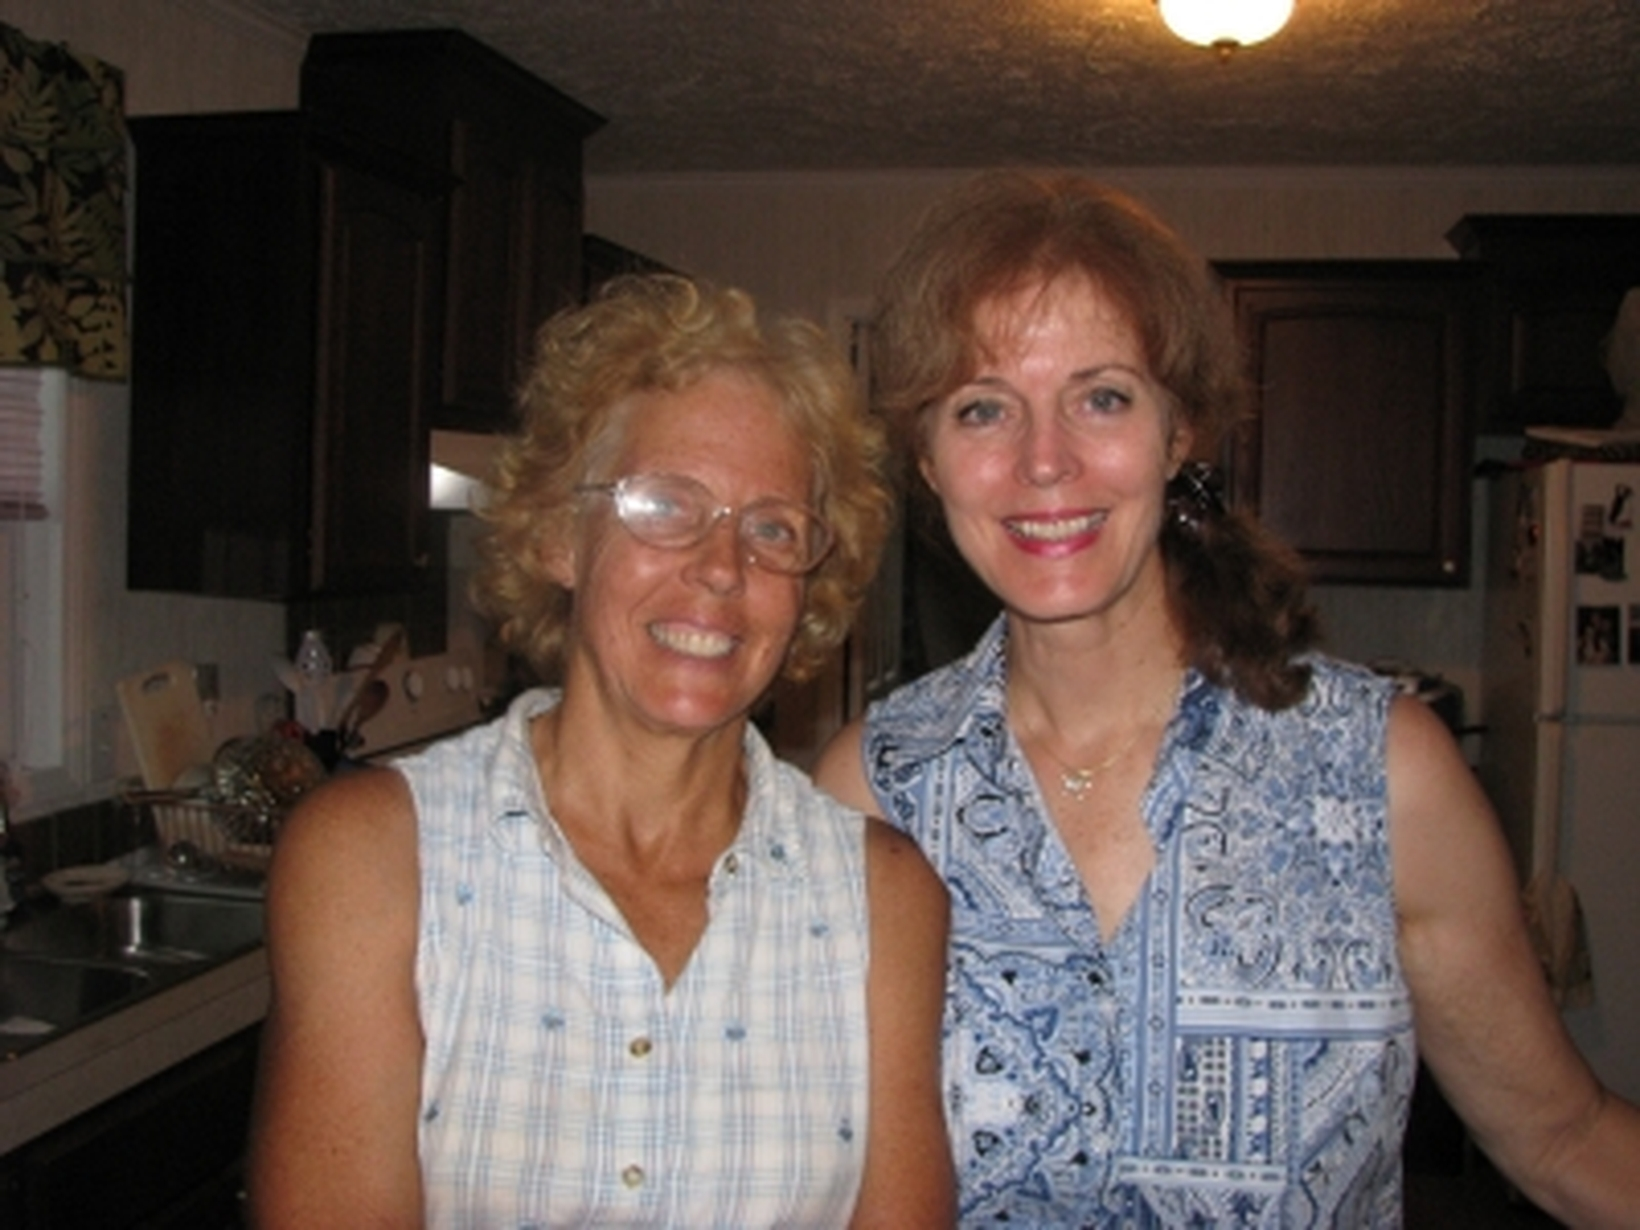 Cindy from Sarasota, FL, United States